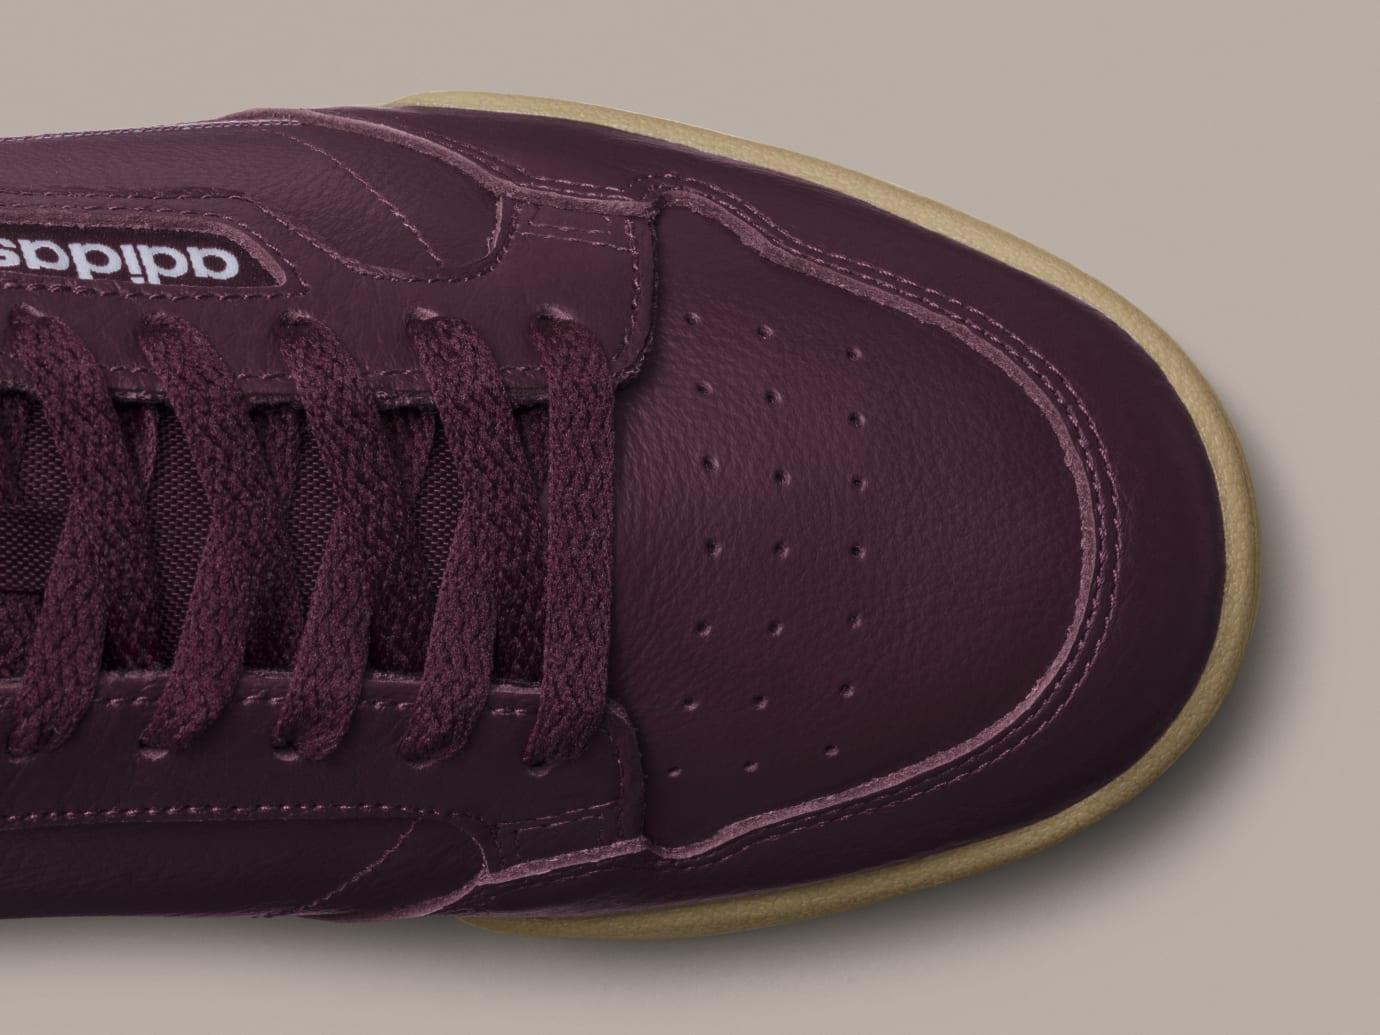 promo code db9b5 2cba4 Image via Adidas Adidas Continental 80 Burgundy B41677 Release Date